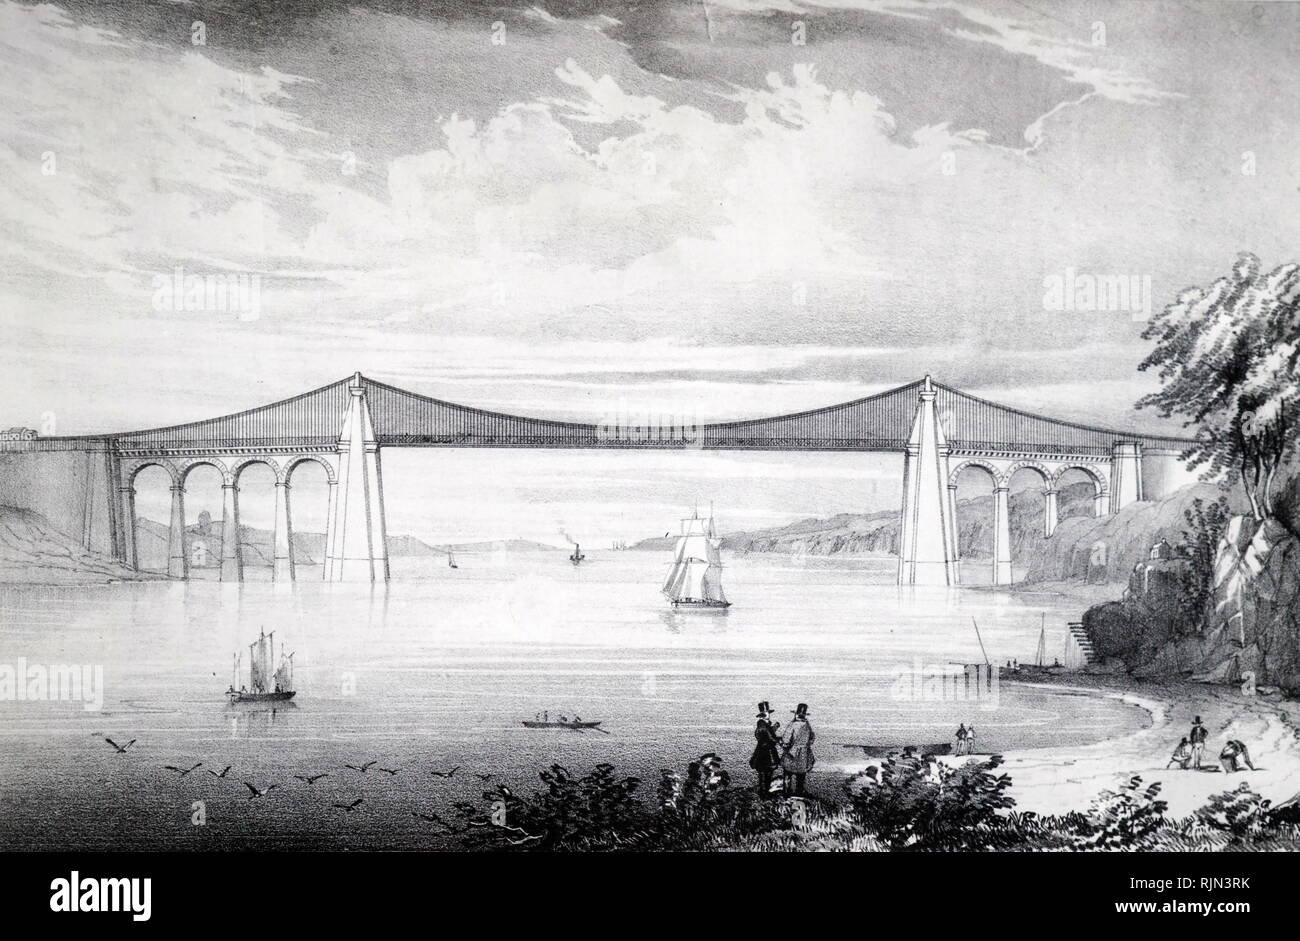 Illustration showing Thomas TELFORD'S suspension bridge over the Menai Straits, built between 1820 and 1826. - Stock Image